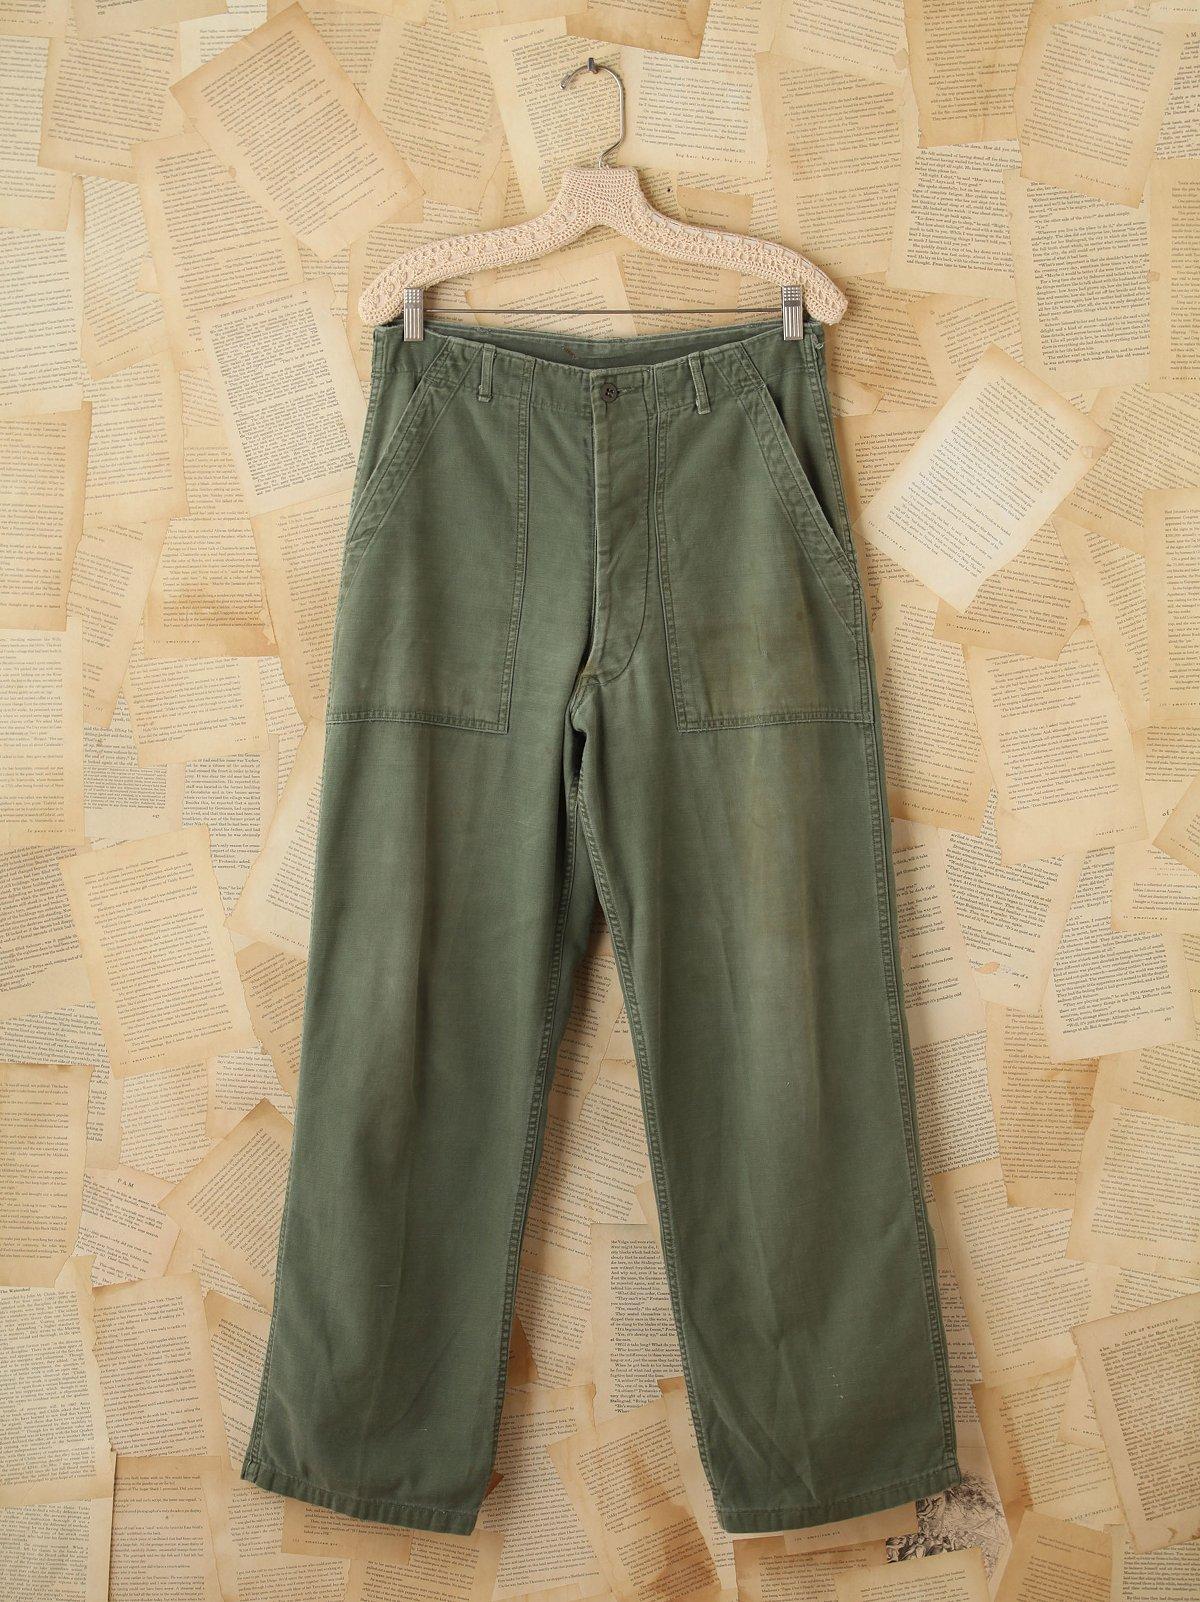 Vintage Military Cargo Pants